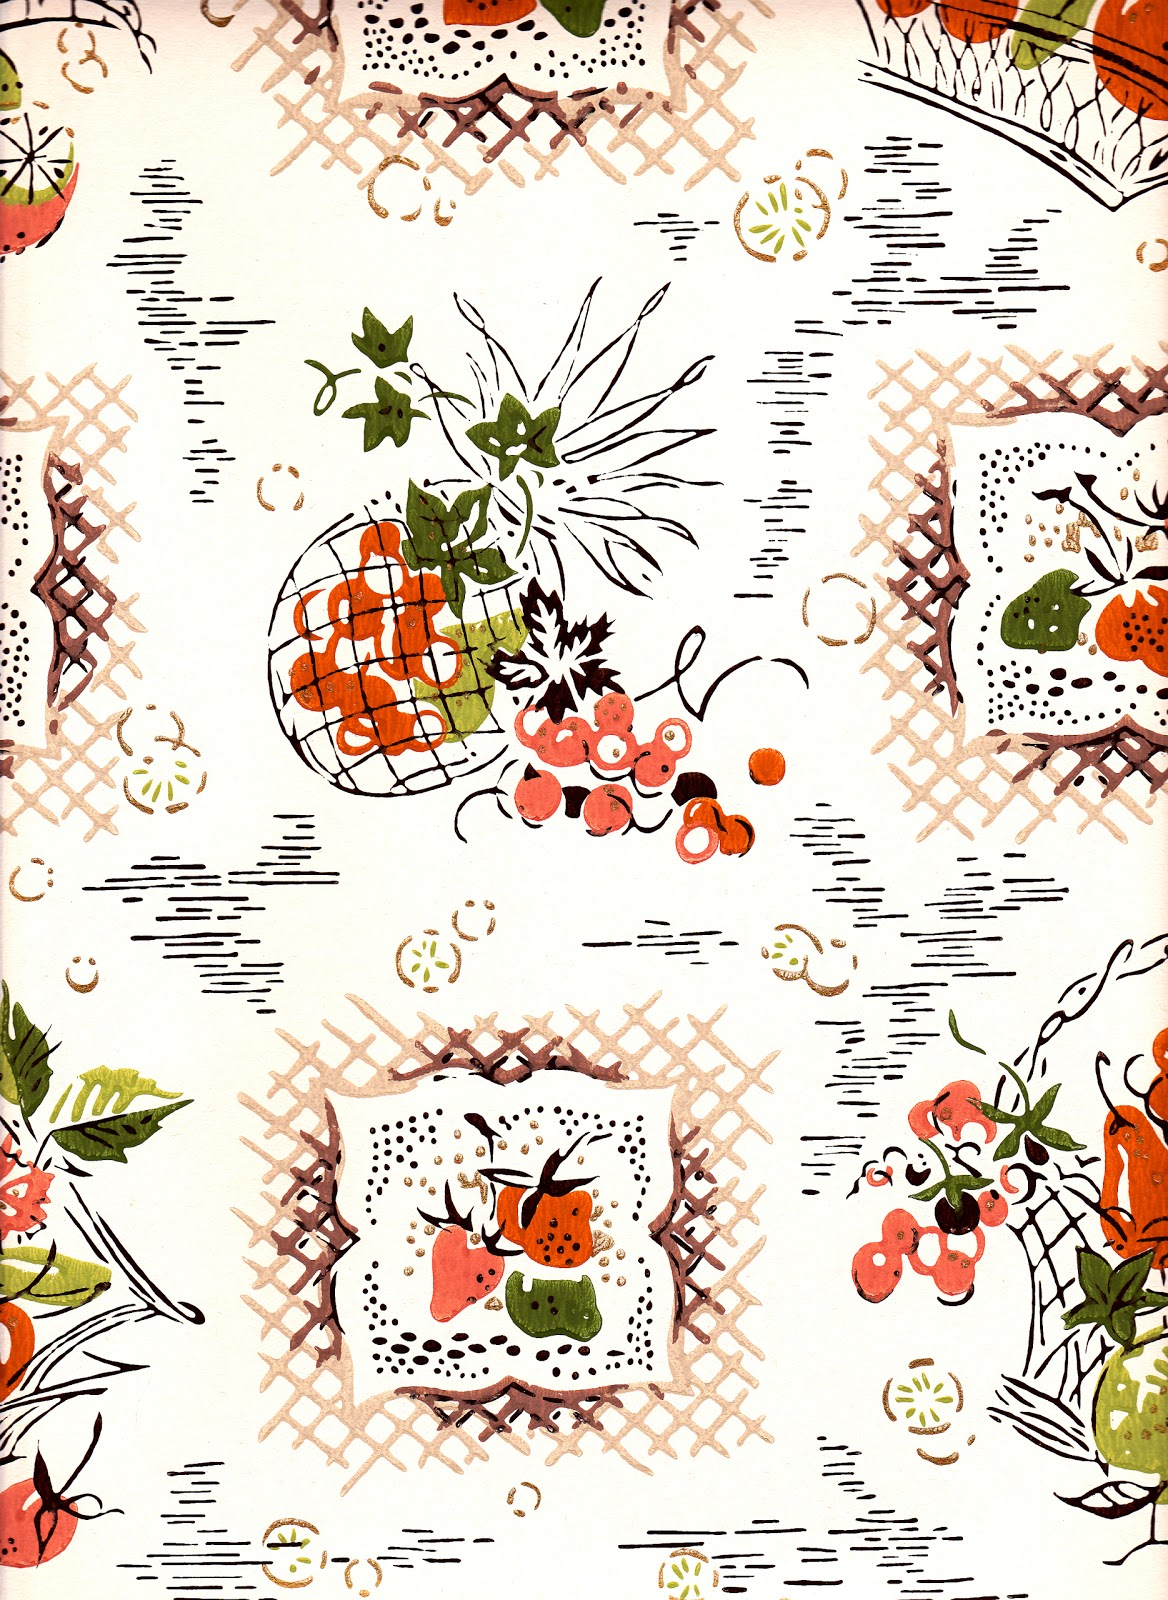 http://3.bp.blogspot.com/-aJT5oocQDuk/TkLJ31sYg7I/AAAAAAAABHA/p_kBZPmd6JU/s1600/fruit+1.jpg